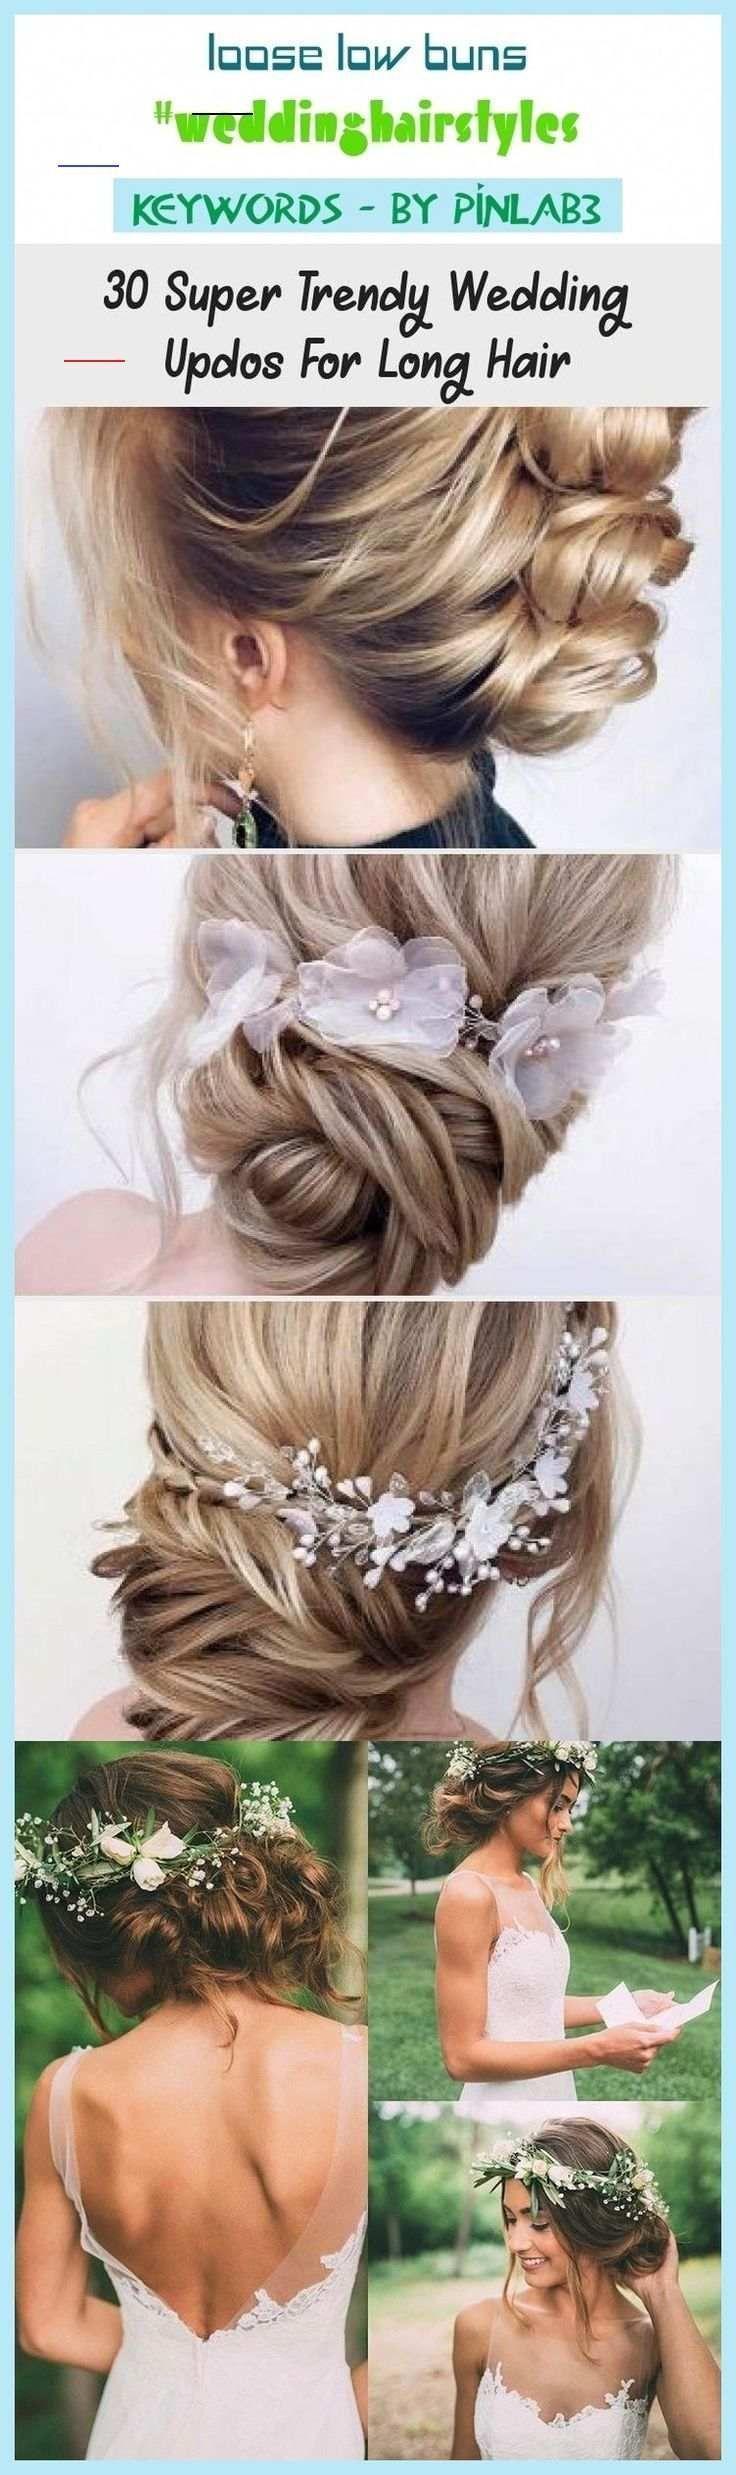 wedding hair front view #wedding #hair #weddinghair Loose low buns #weddinghairs...#buns #front ...